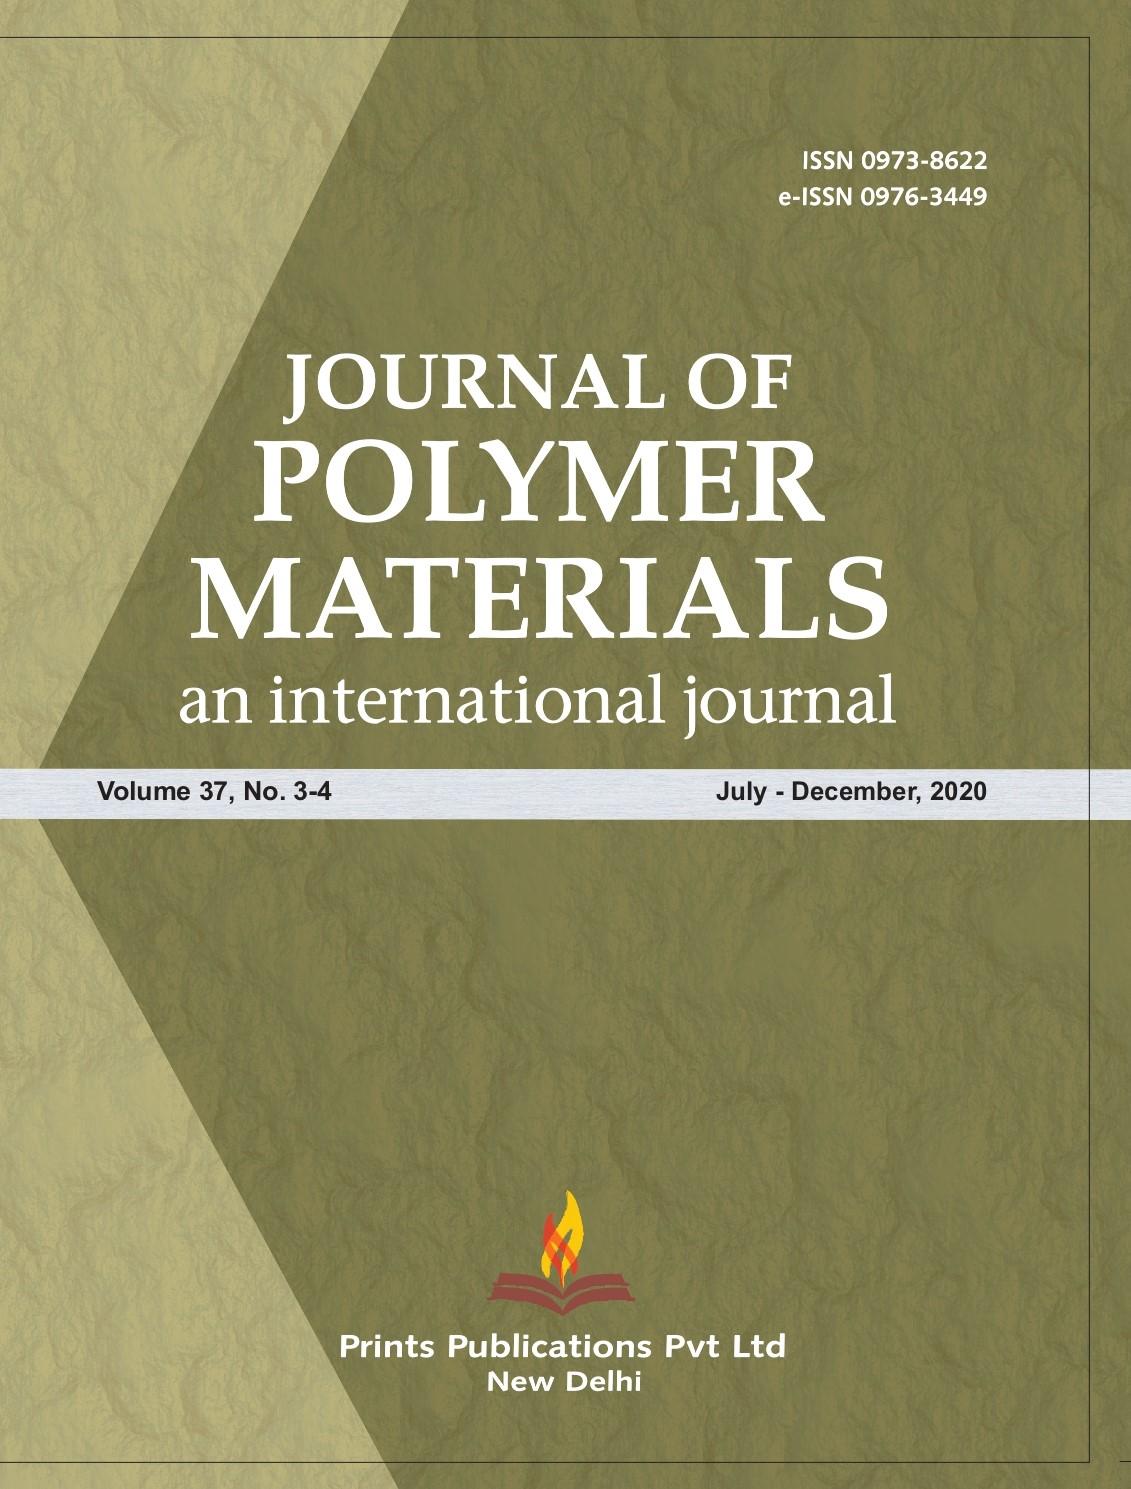 JOURNAL OF POLYMER MATERIAL - (QUARTERLY (JANUARY-DECEMBER) VOL. 37 (2020)